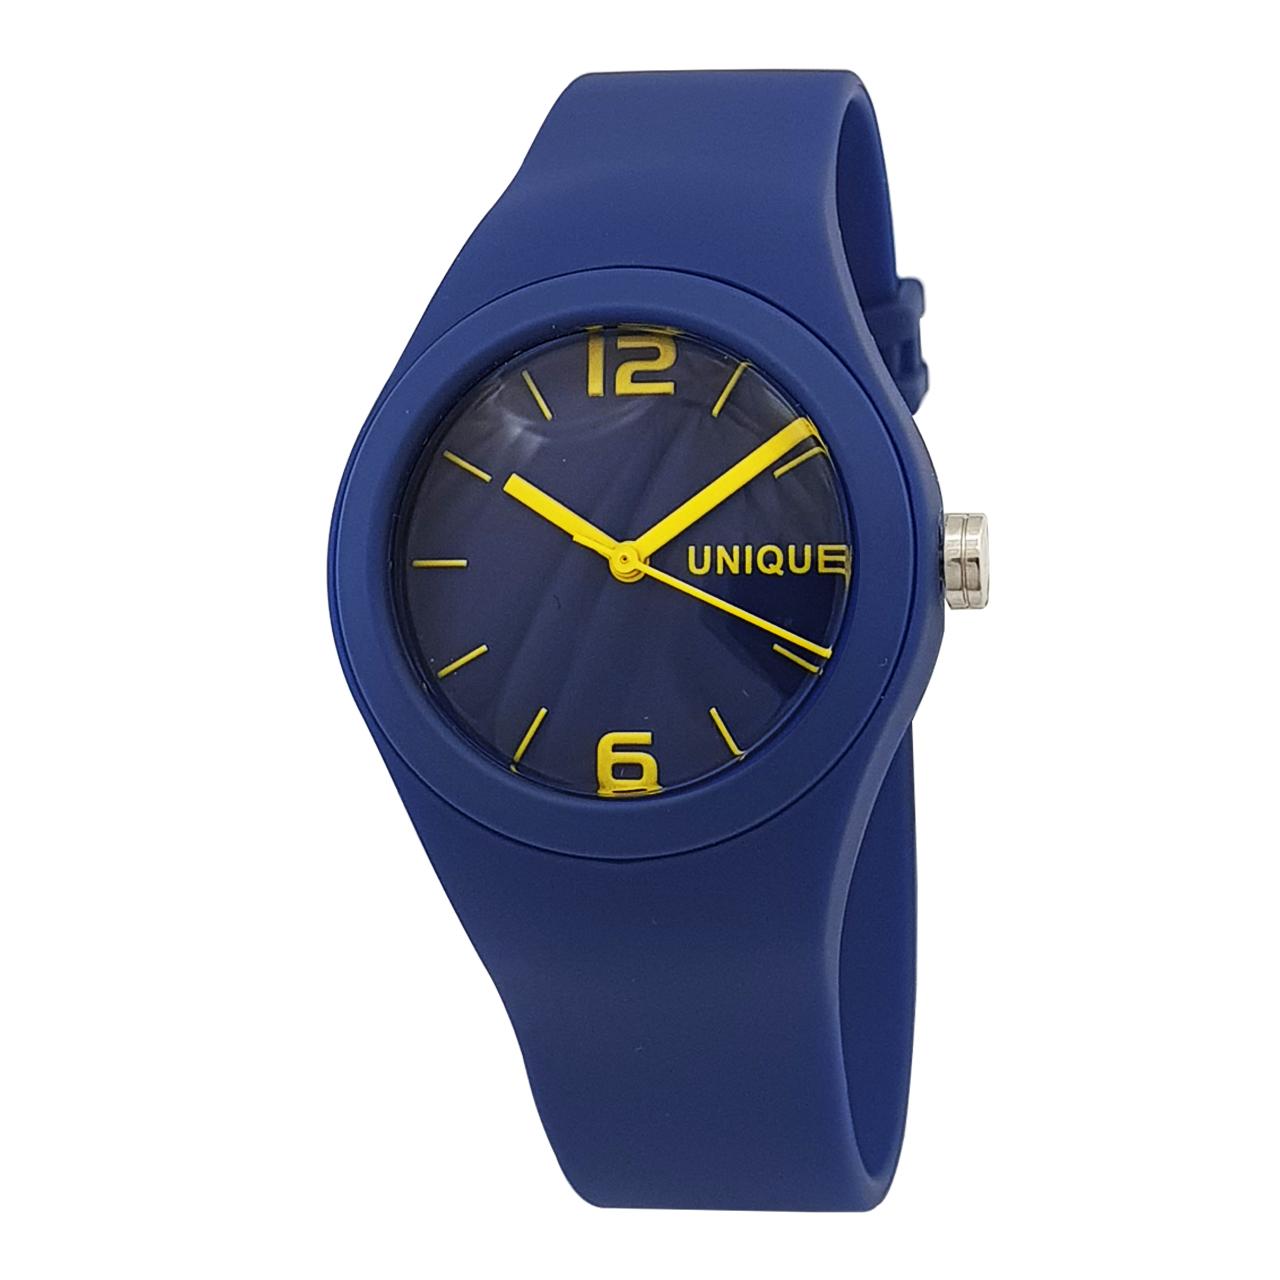 ساعت مچی عقربه ای زنانه یونیک مدل un-2500-b